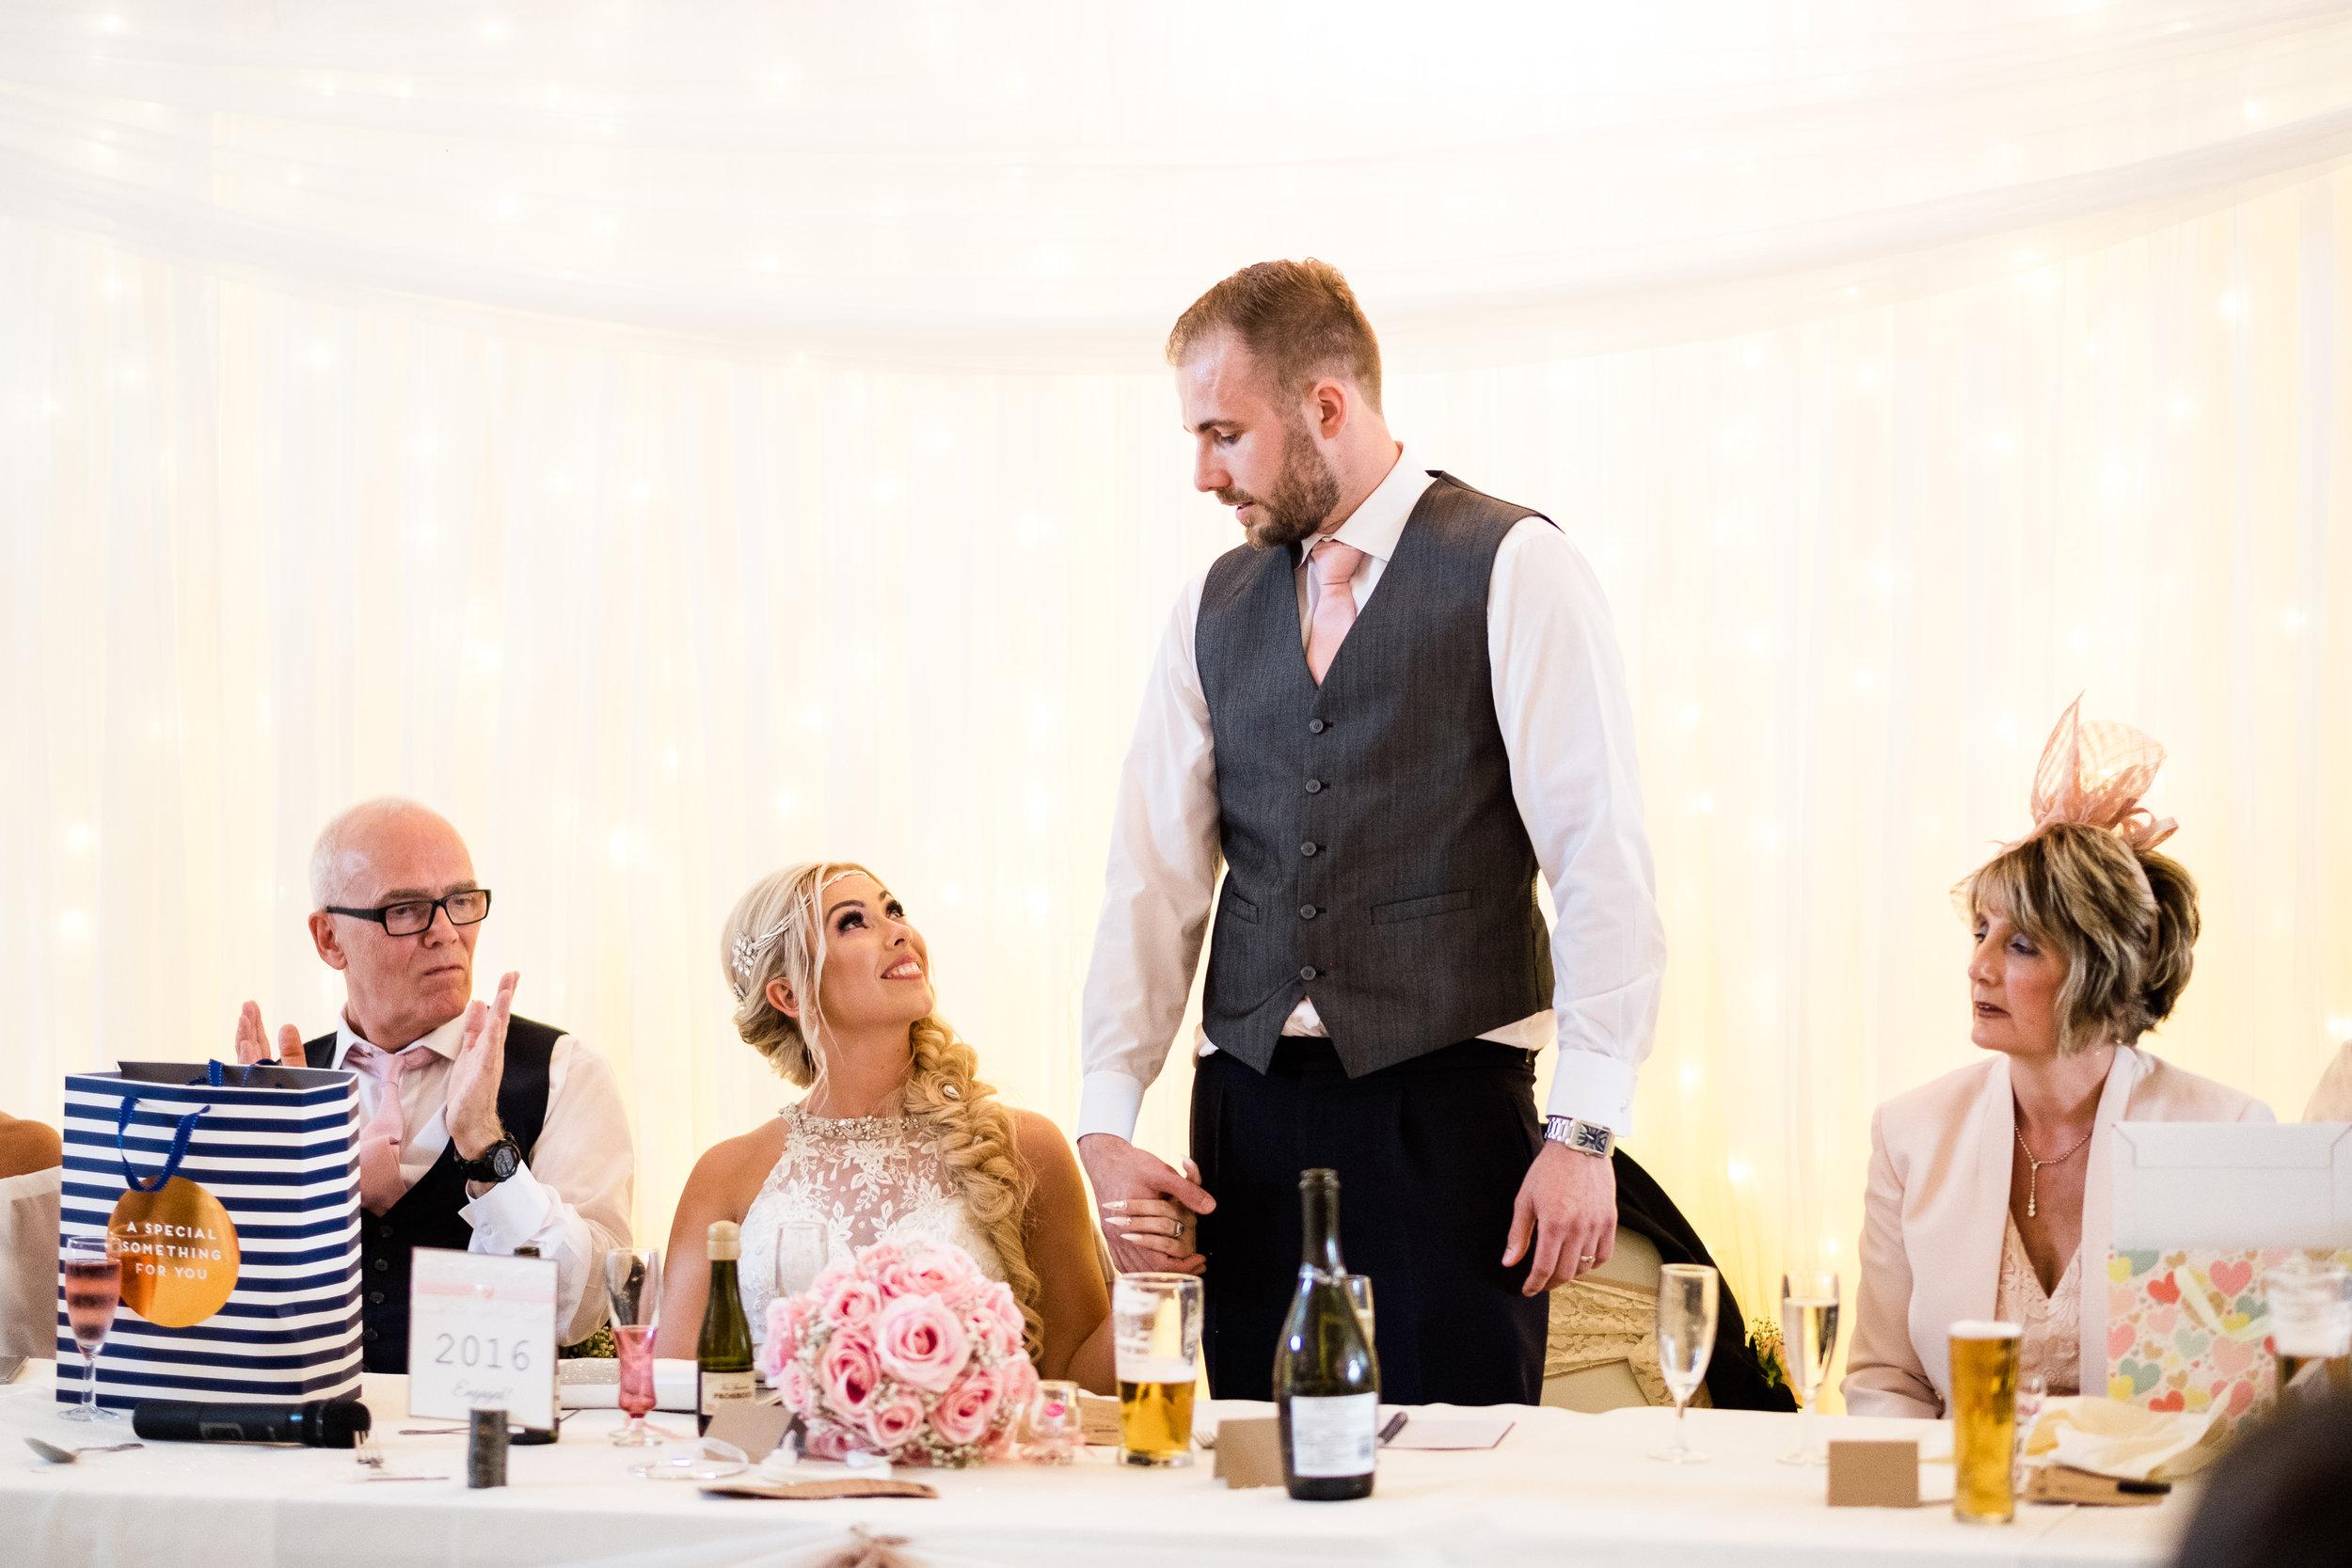 Summer Documentary Wedding Photography Floral Hall, Stoke-on-Trent, Staffordshire - Jenny Harper-47.jpg